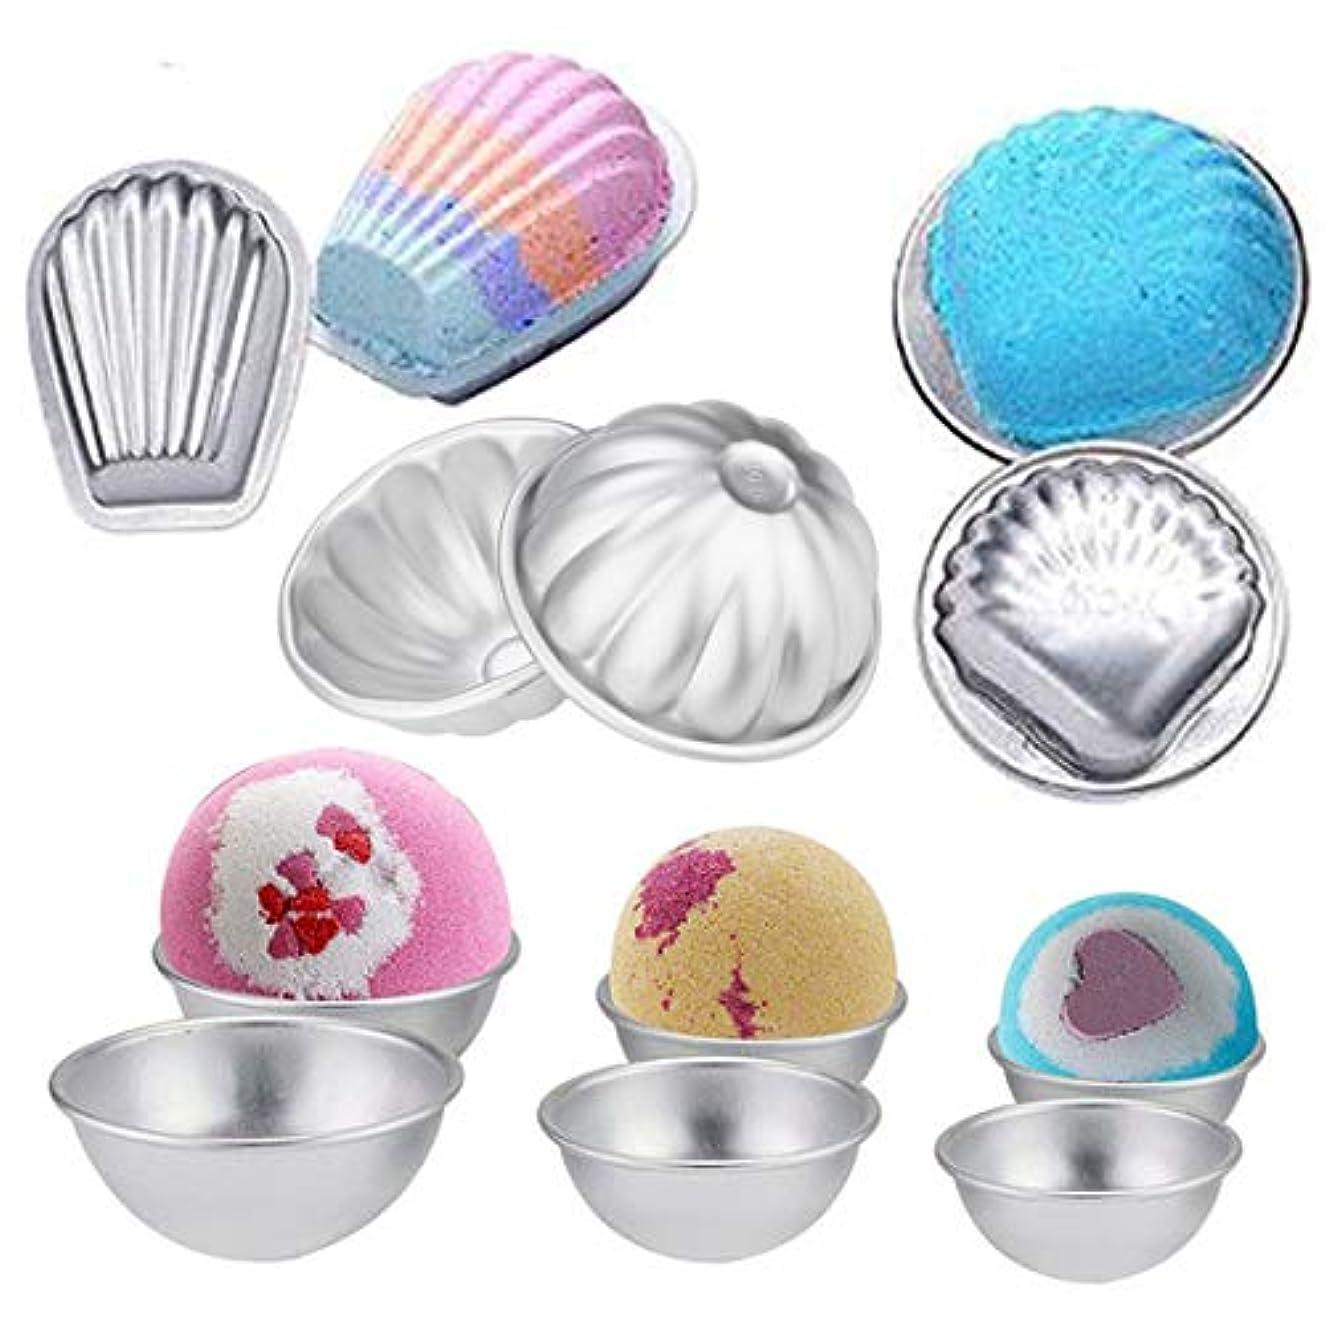 6 Set DIY Metal Bath Bomb Molds for Bath Salts,Soap, Cupcake Baking,Include 6 Hemispheres, 2 Shells, 2 Scallops, 2 Flower